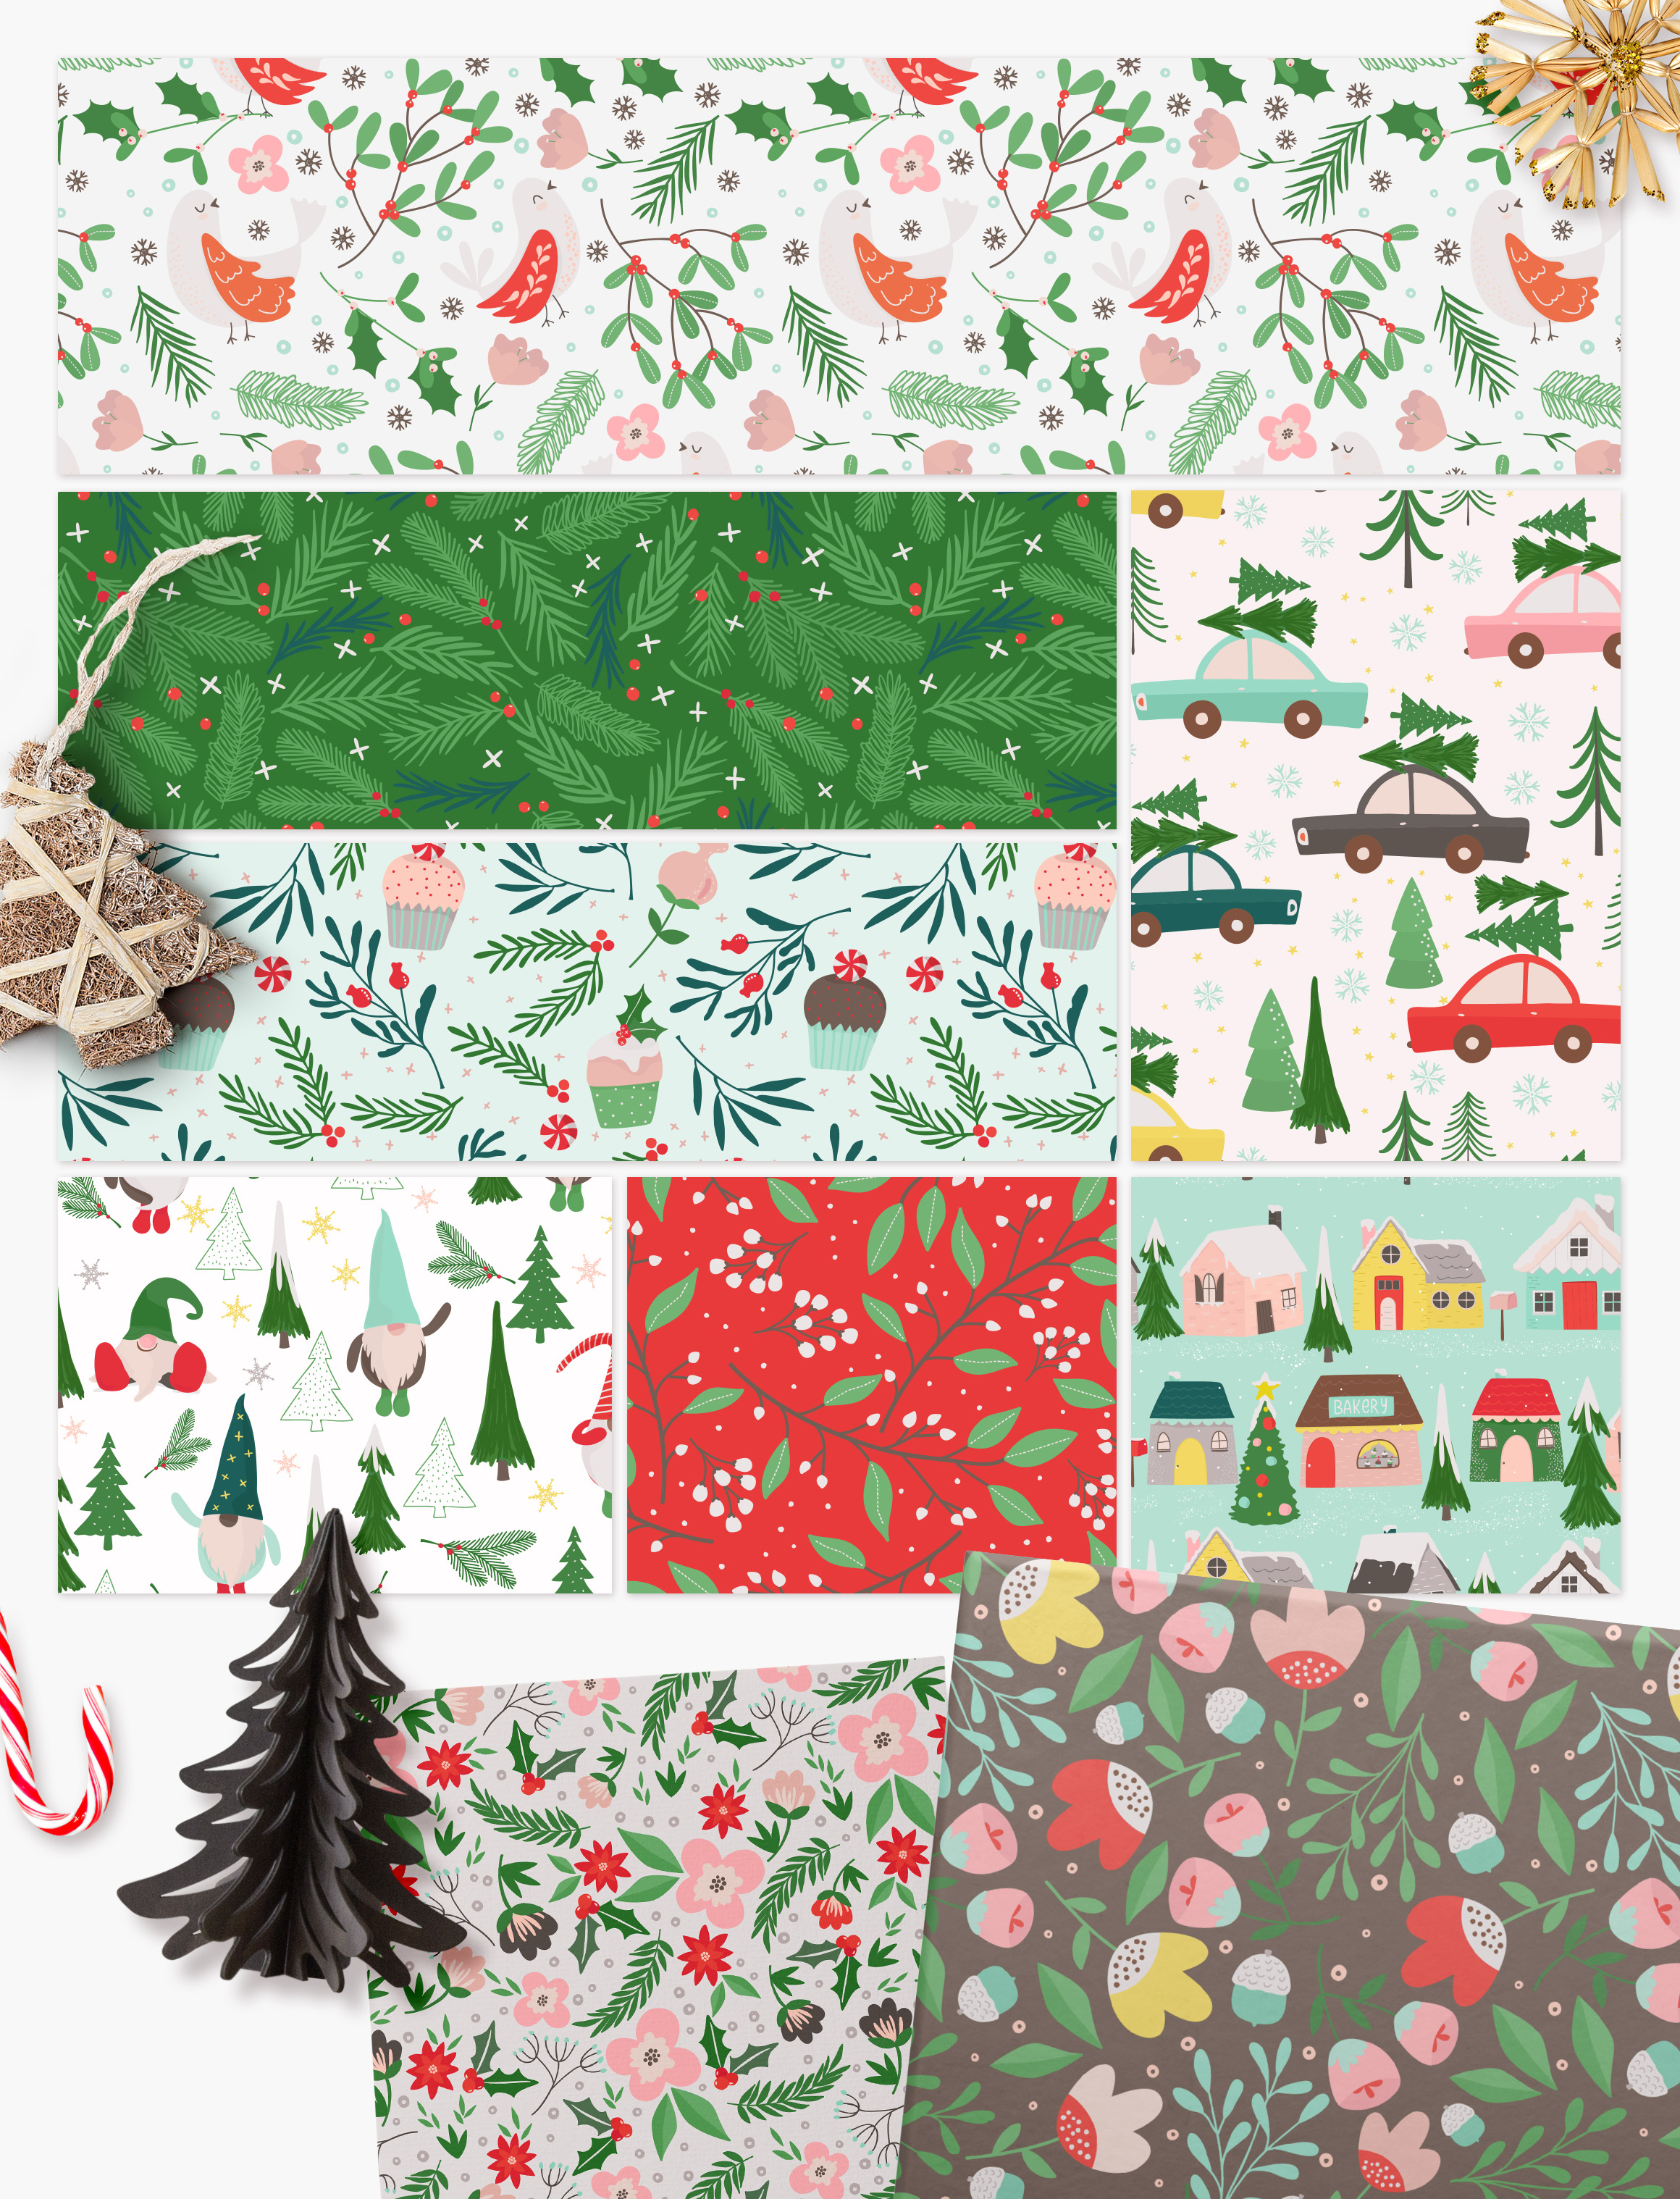 Winter Village Seamless Patterns example image 5